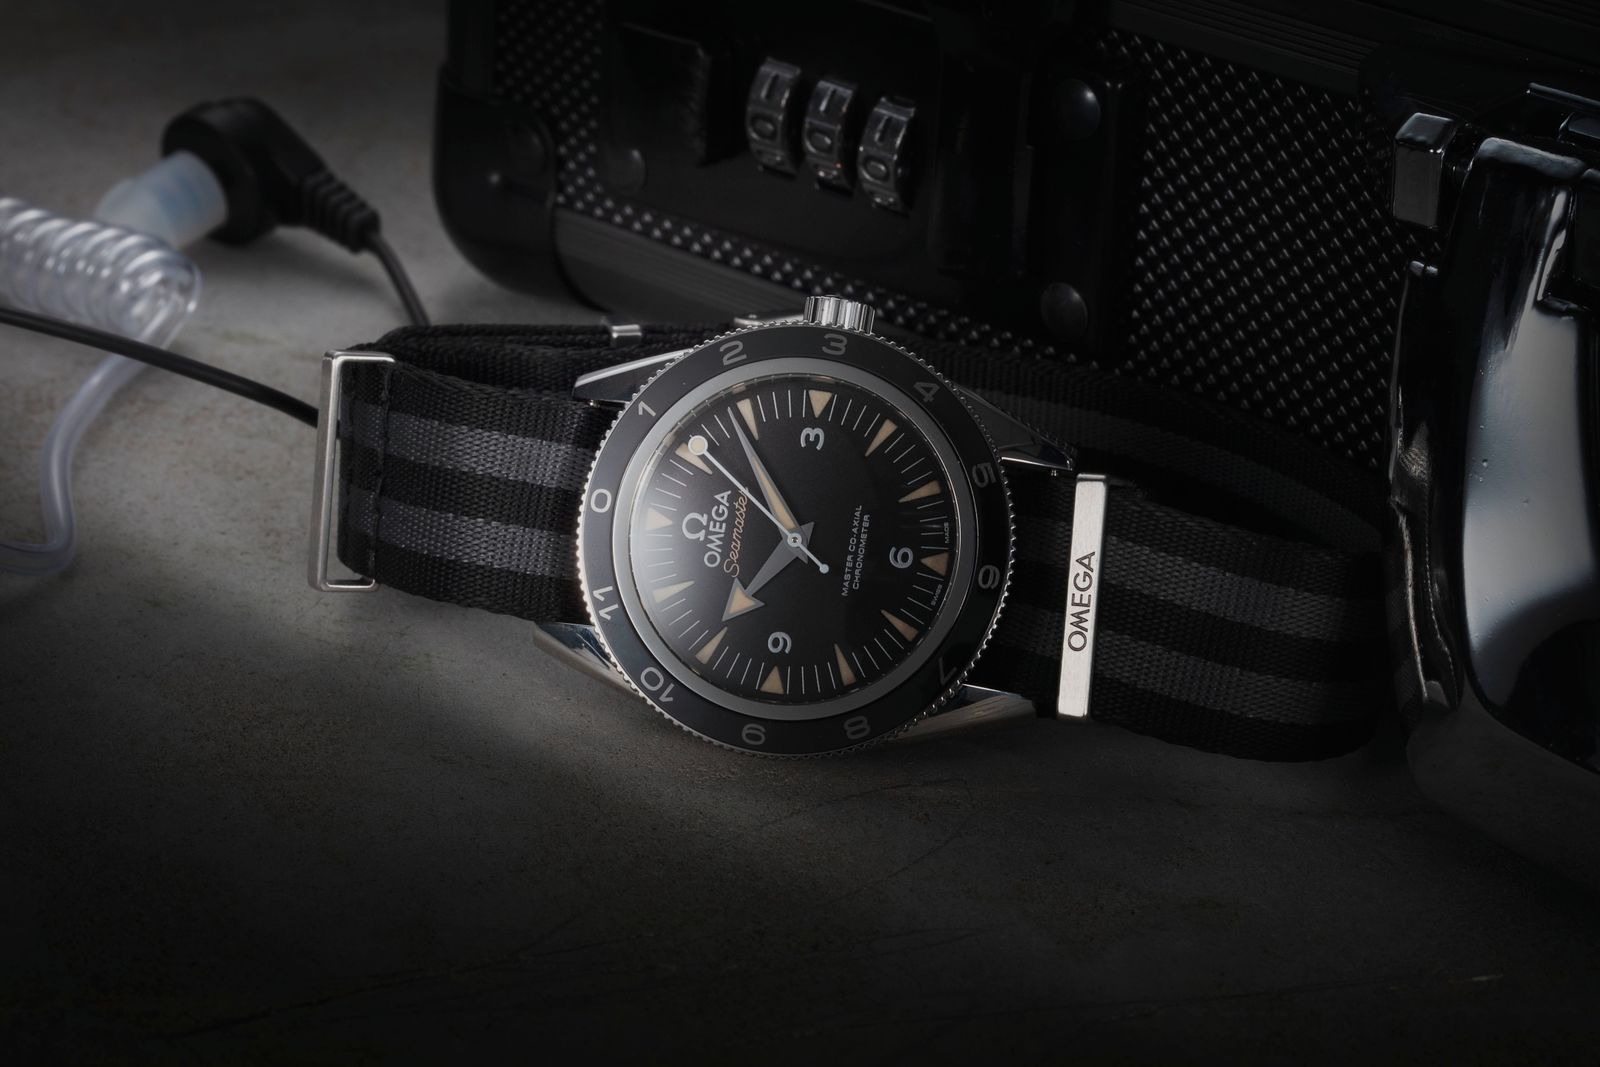 Daniel Craig - Omega Seamaster 300 Spectre Limited Edition 233.32.41.21.01.001